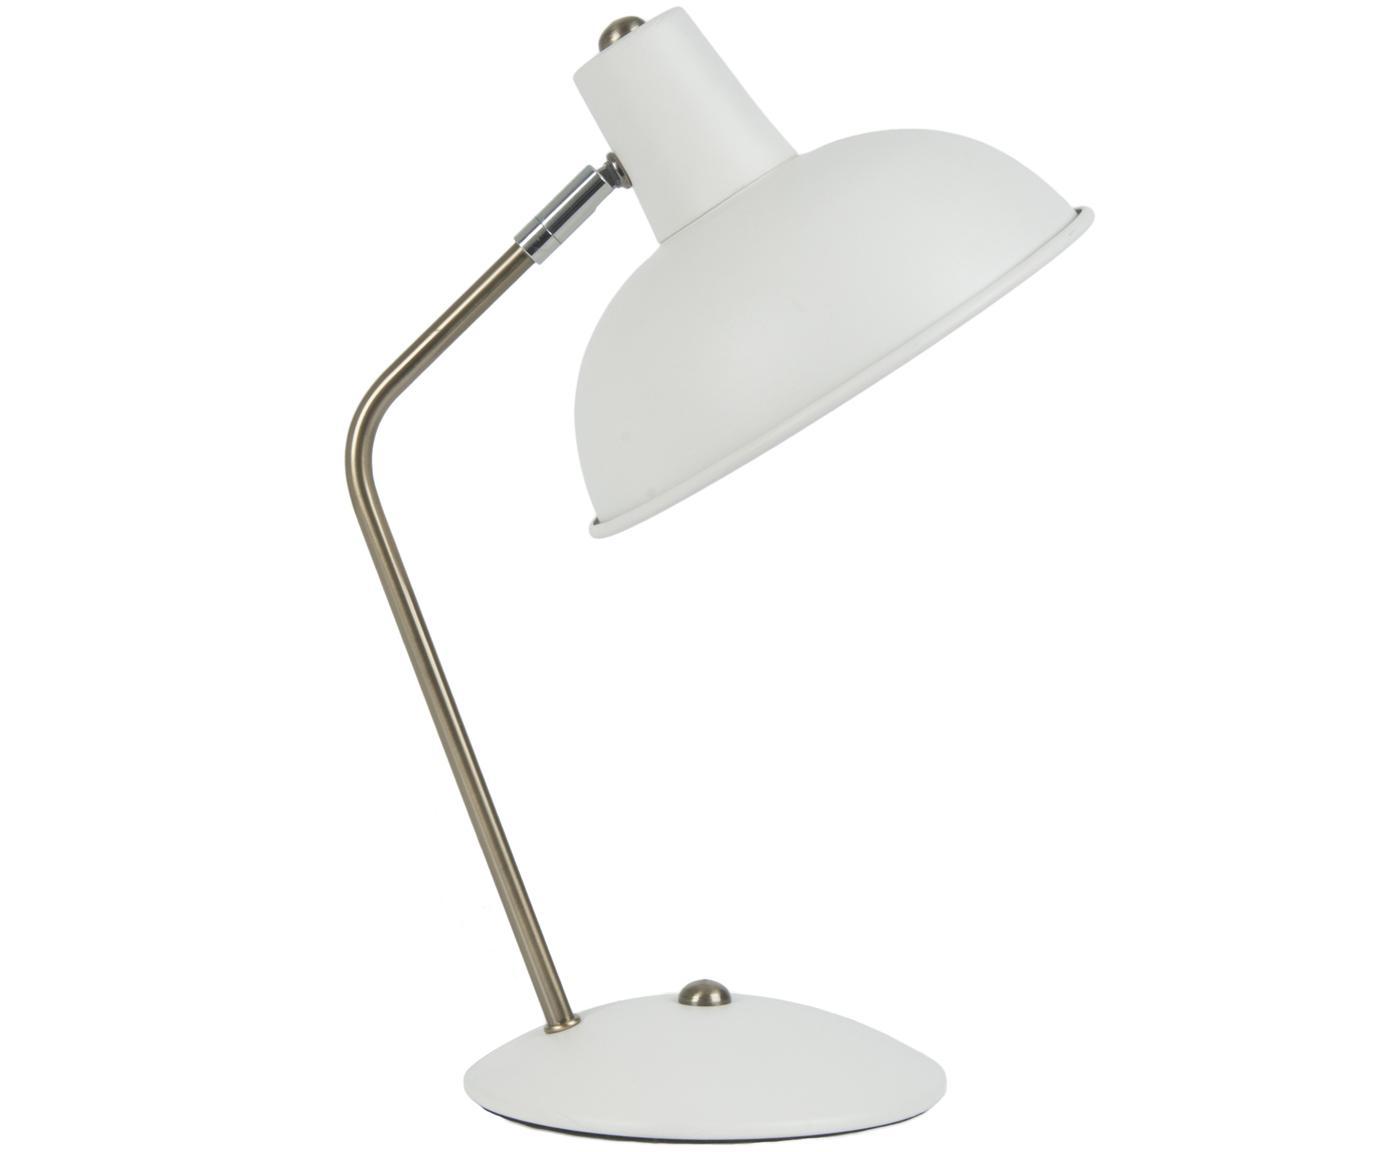 Lampada da tavolo retrò Hood, Bianco, ottone, Larg. 20 x Alt. 38 cm